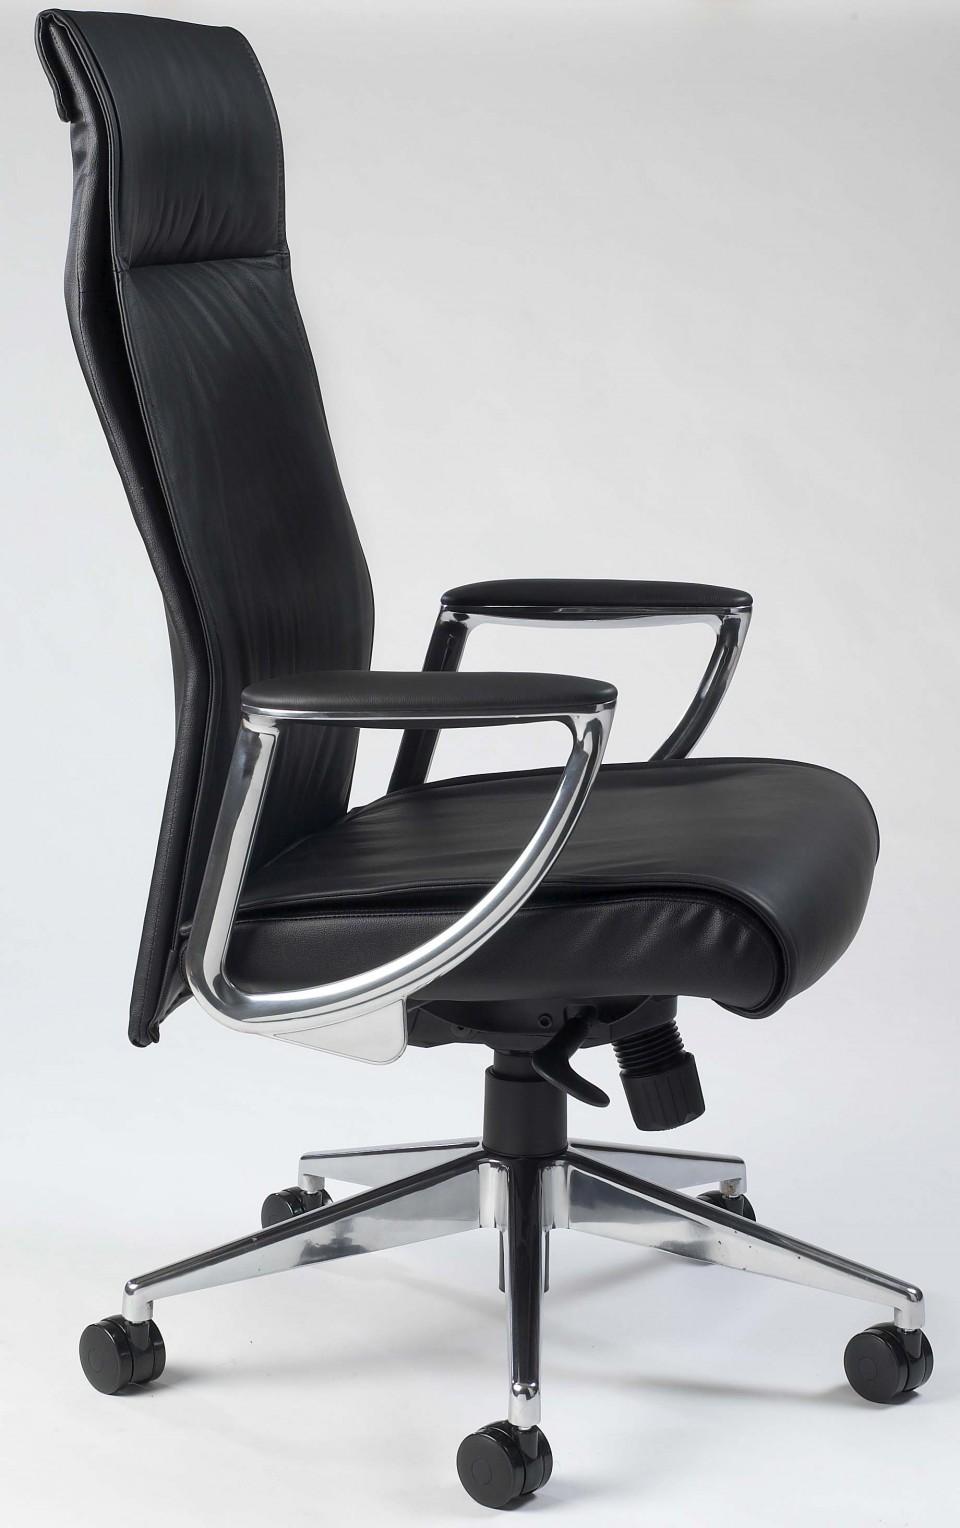 fauteuil de direction cuir fto hd t ti re achat fauteuil bureau cuir 449 00. Black Bedroom Furniture Sets. Home Design Ideas